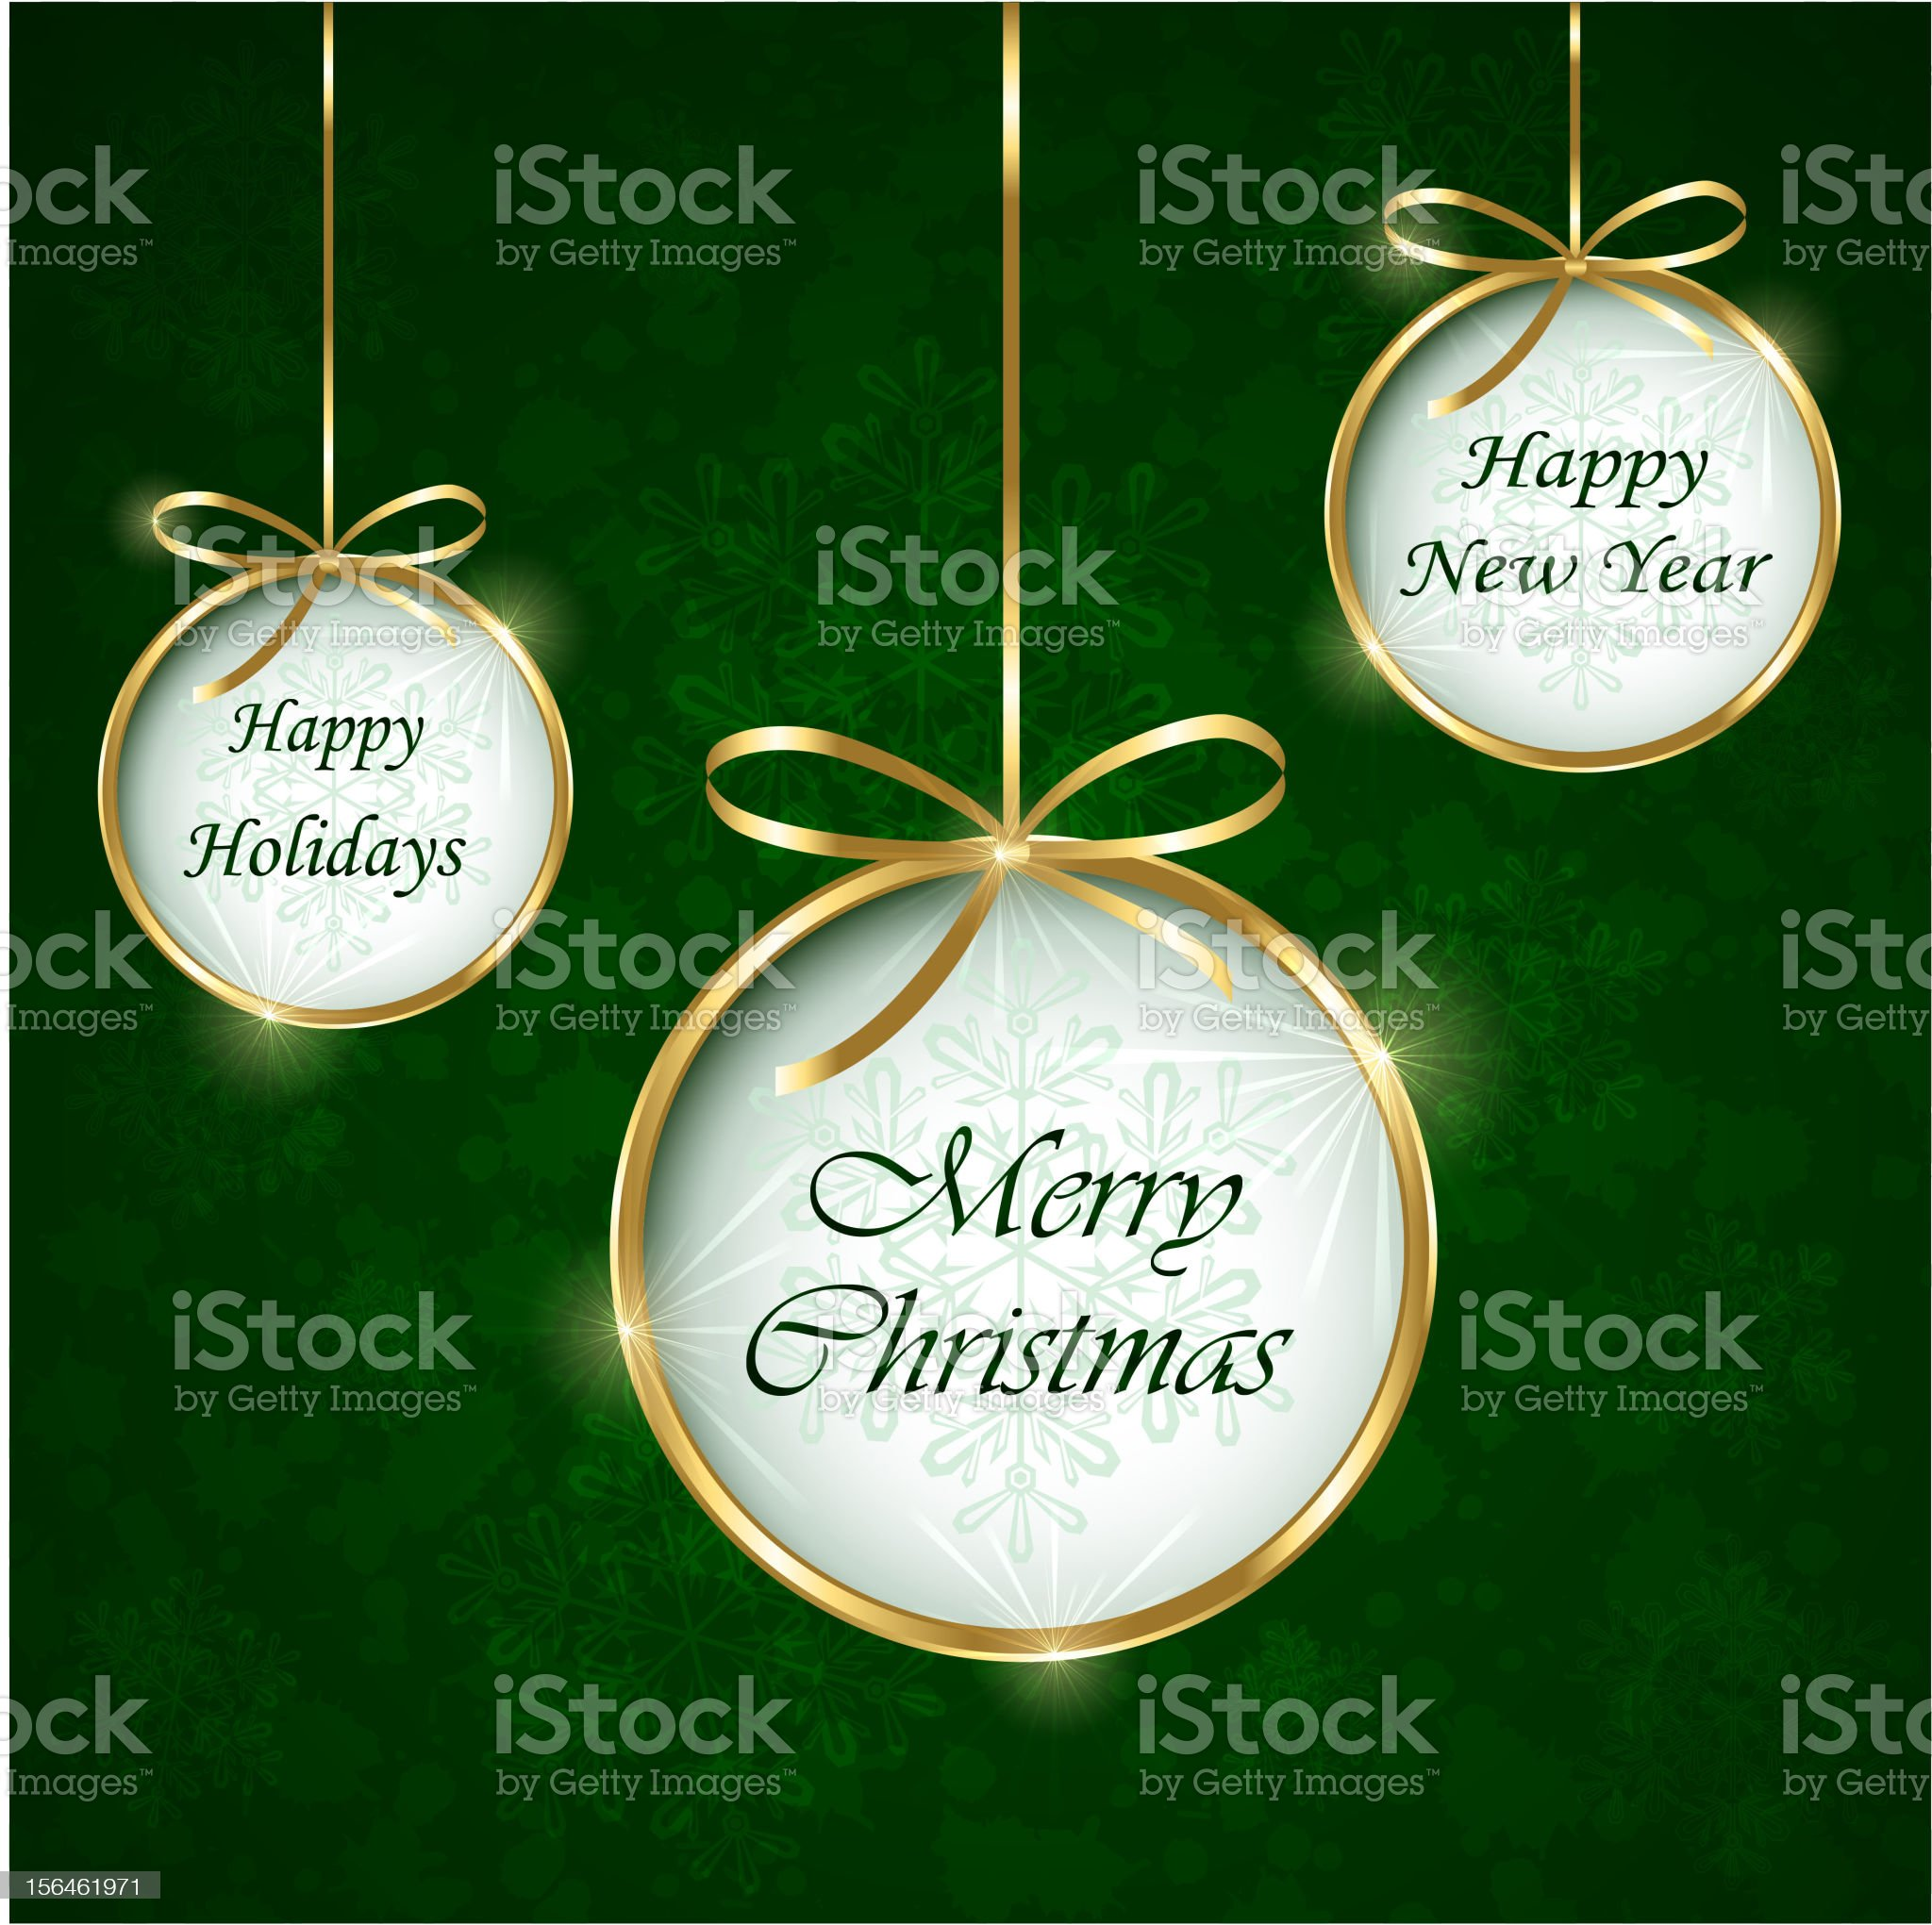 Green New Year and Christmas Holidays greetings card royalty-free stock vector art